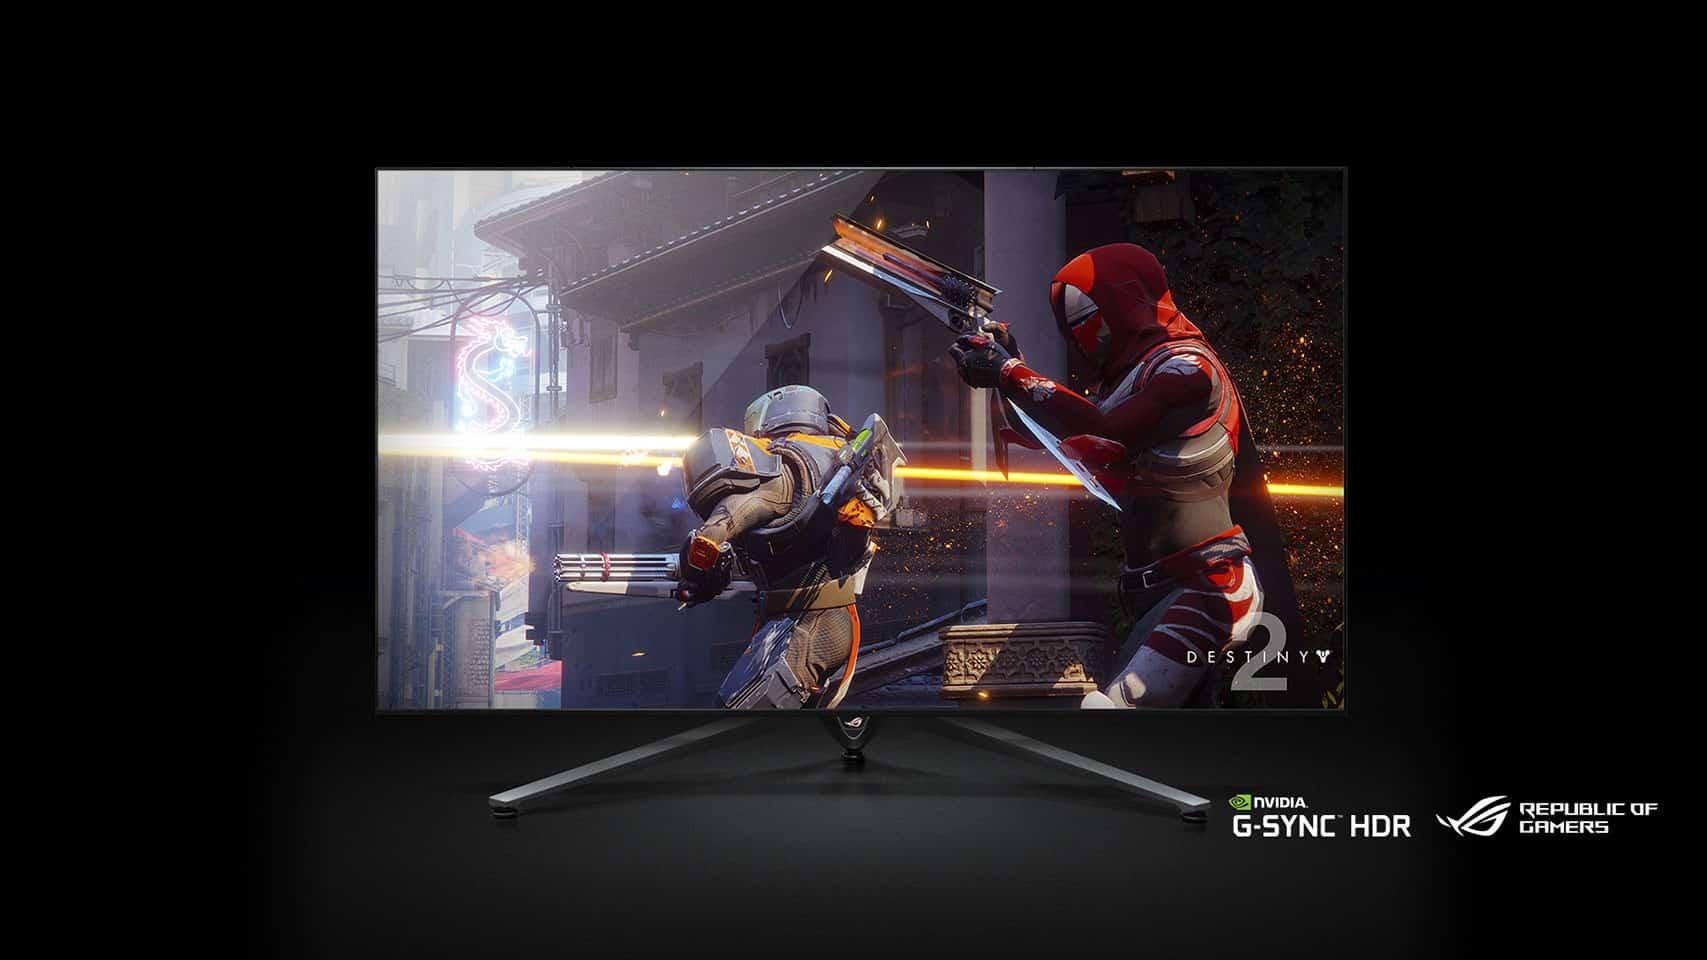 ROG Swift PG65 BFGD - ASUS Republic of Gamers annuncia ROG Swift PG65 BFGD